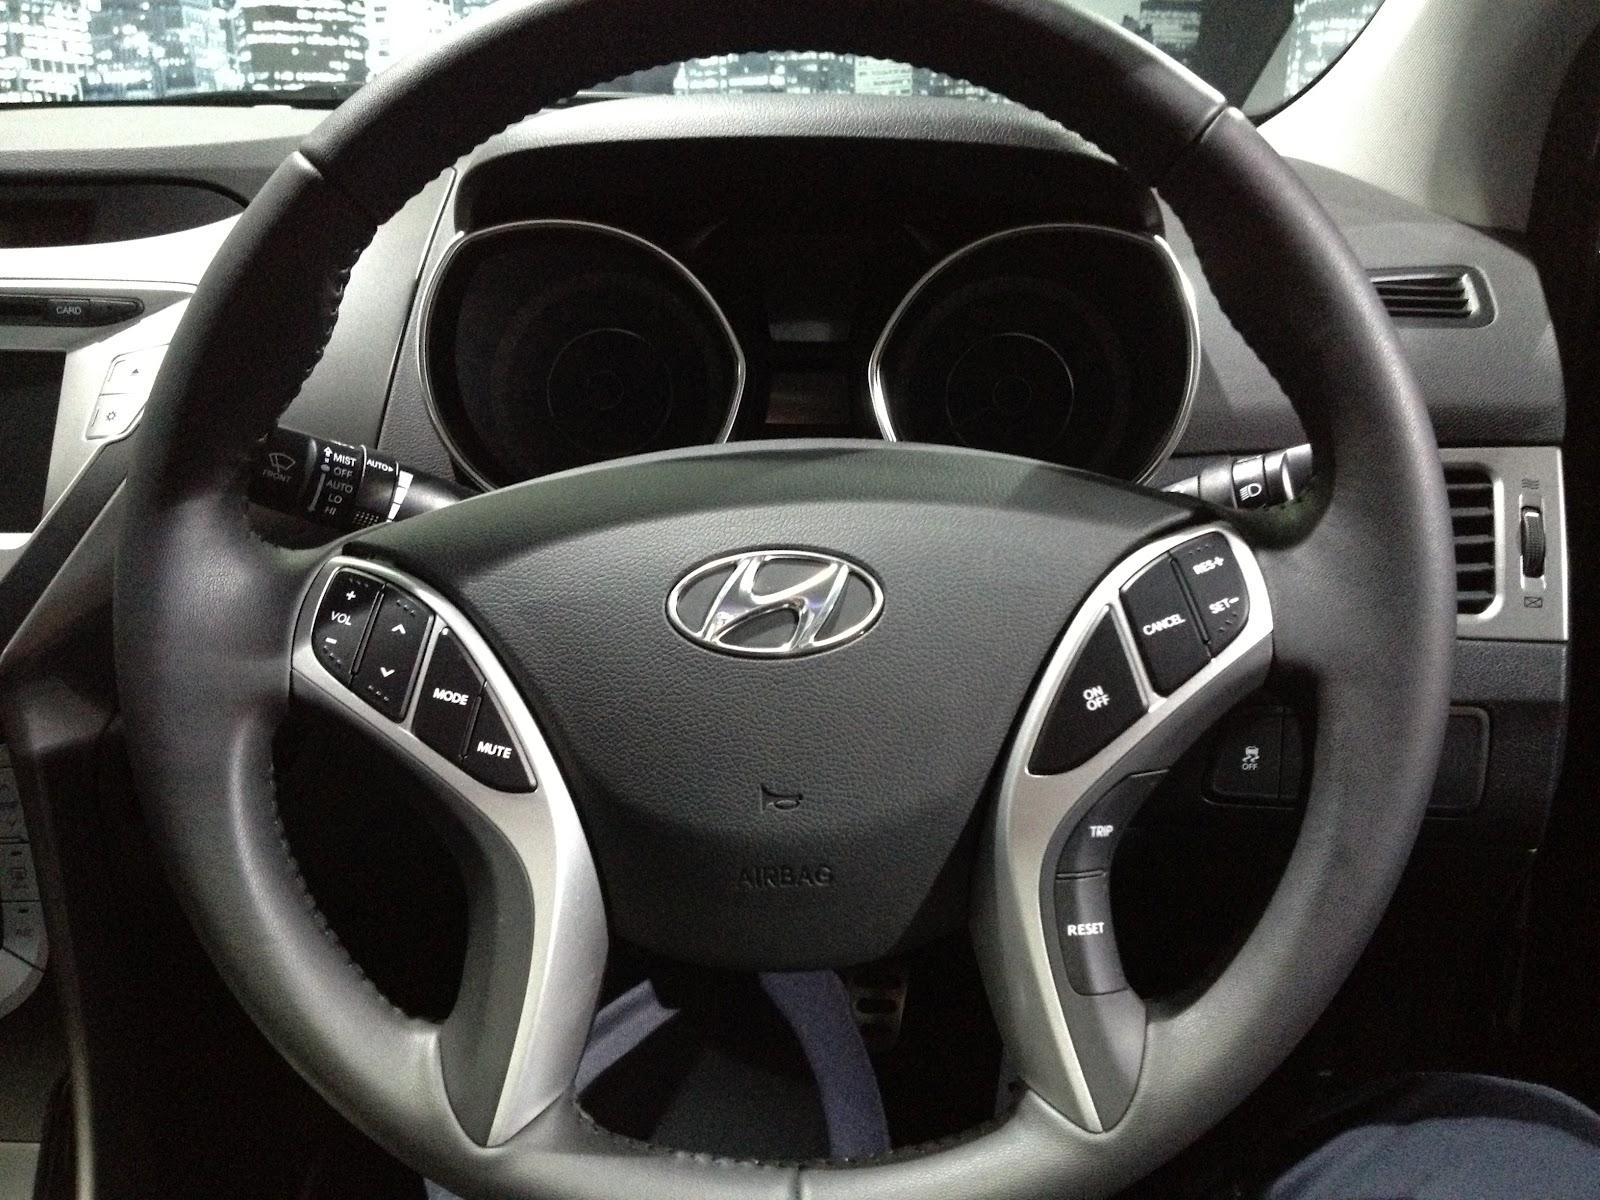 The Hyundai Elantra Hello Impossible Kensomuse Power Steering Leak Forums Forum